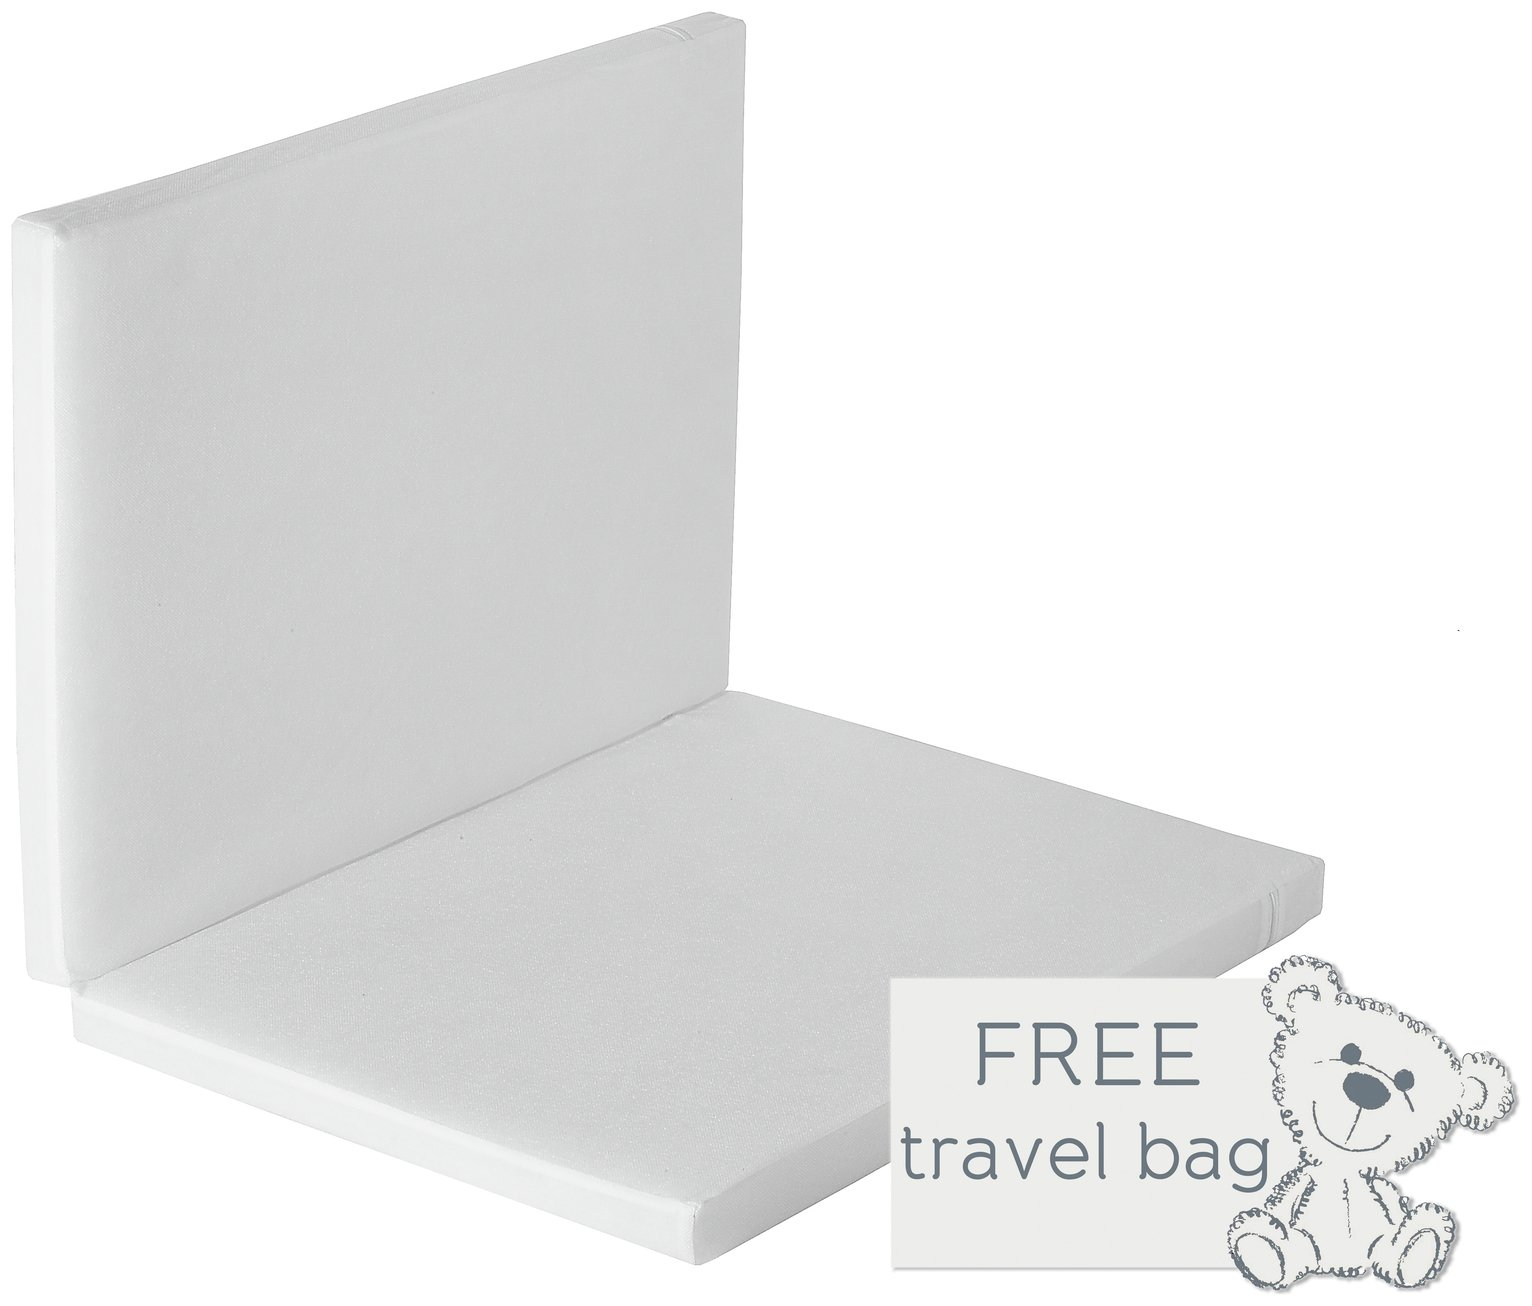 Baby elegance 94 x 66cm cool flow cot mattress